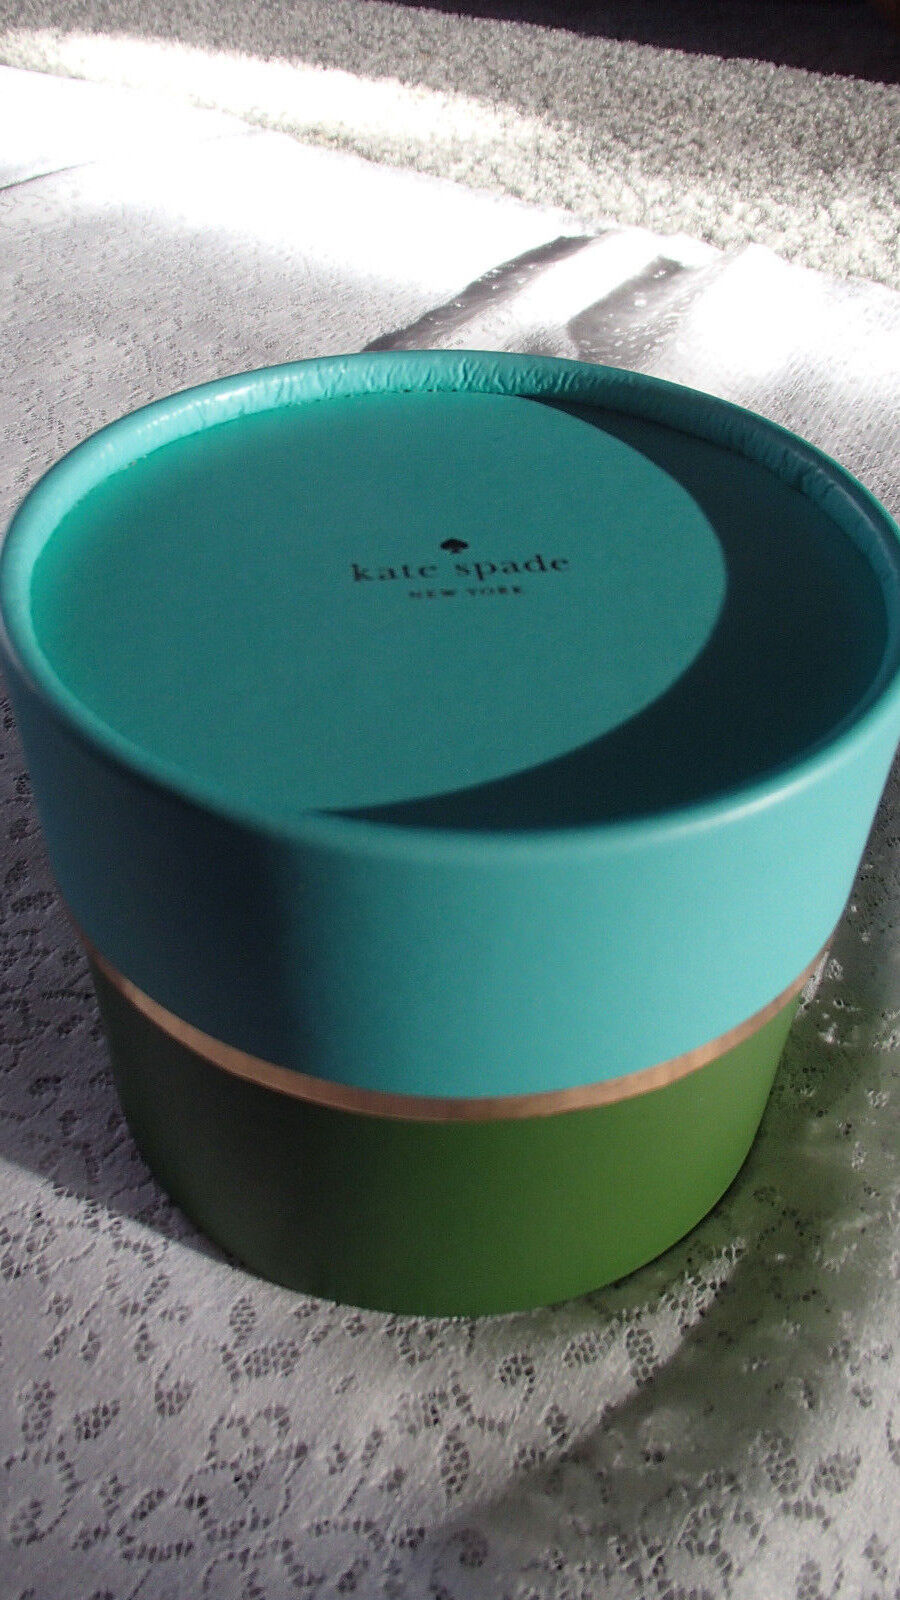 Kate Spade Center Logo Gift Box, Round Blue/Green